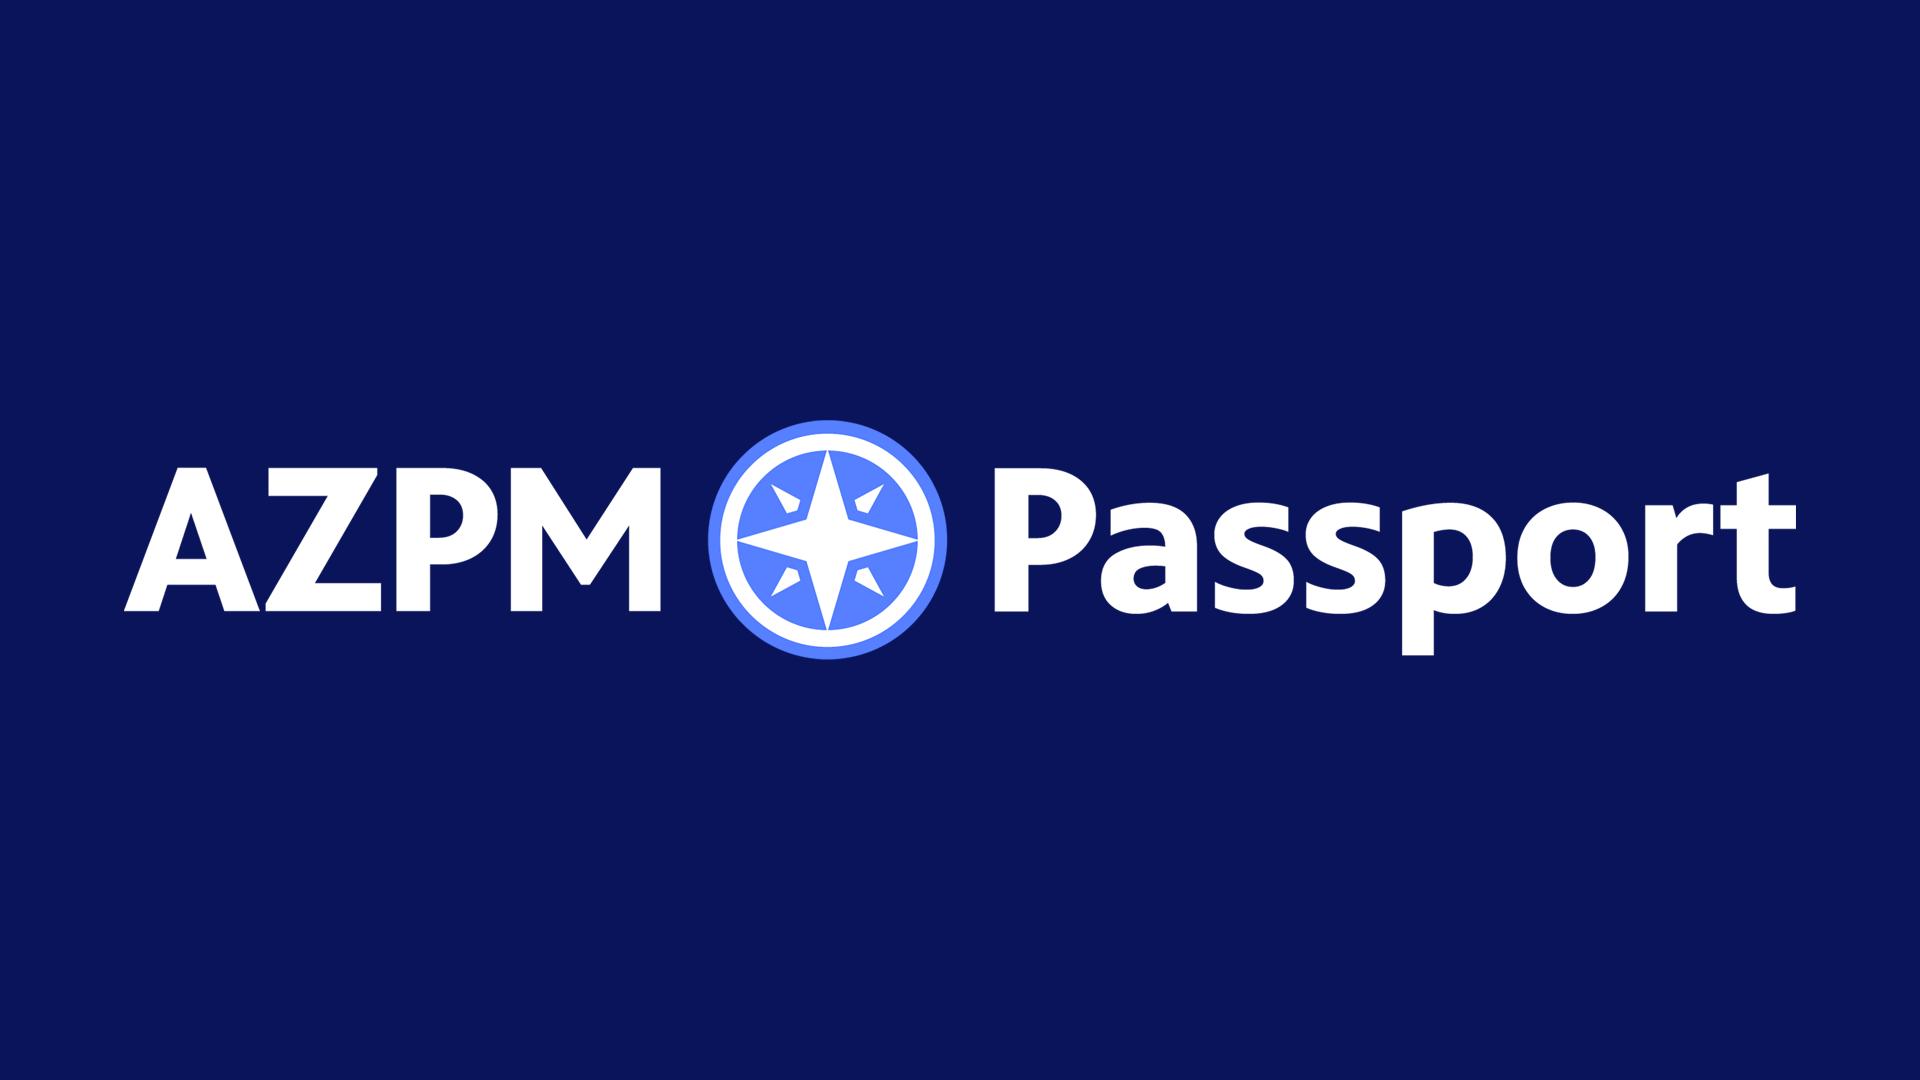 AZPM Passport new lockup OG